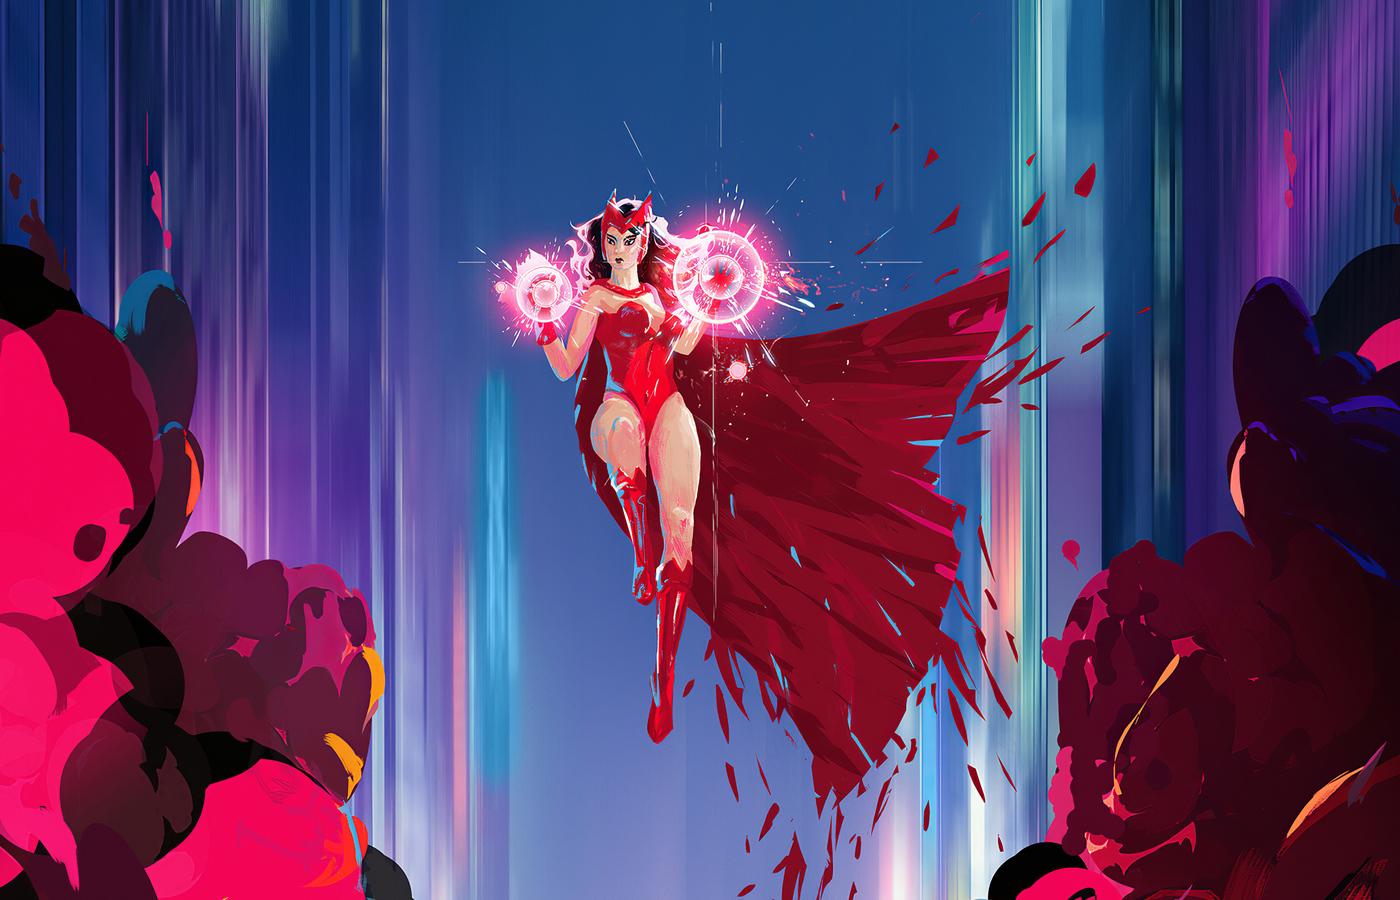 scarlet-witch-power-4k-art-uo.jpg